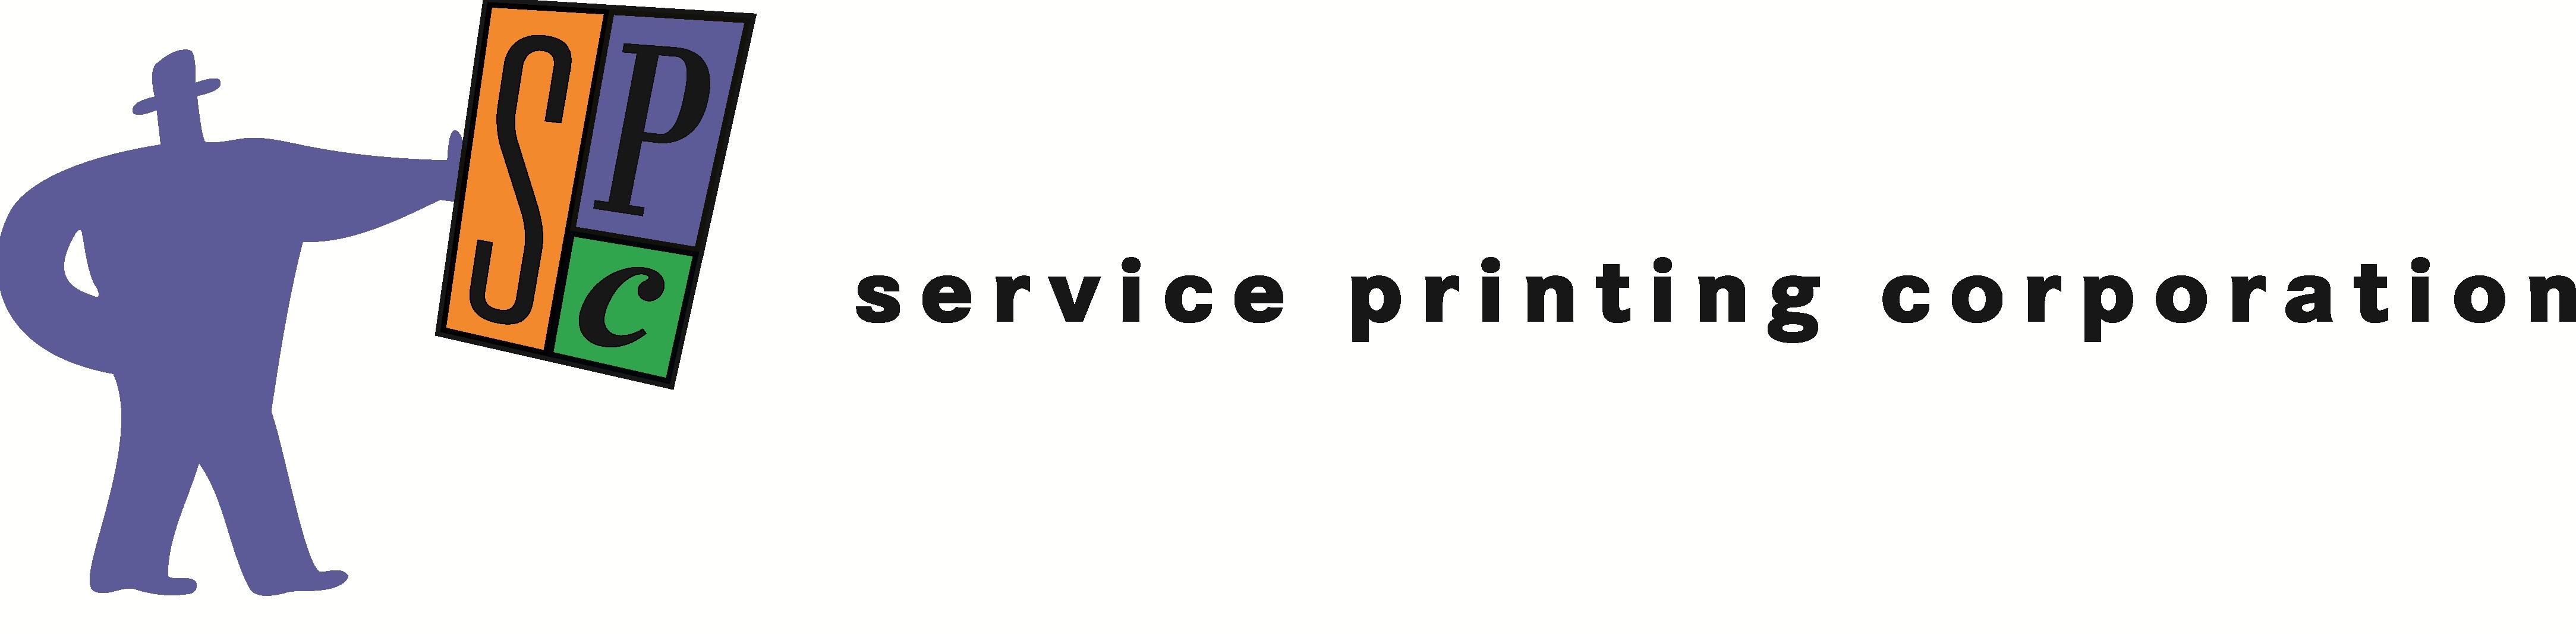 Service Printing Corporation